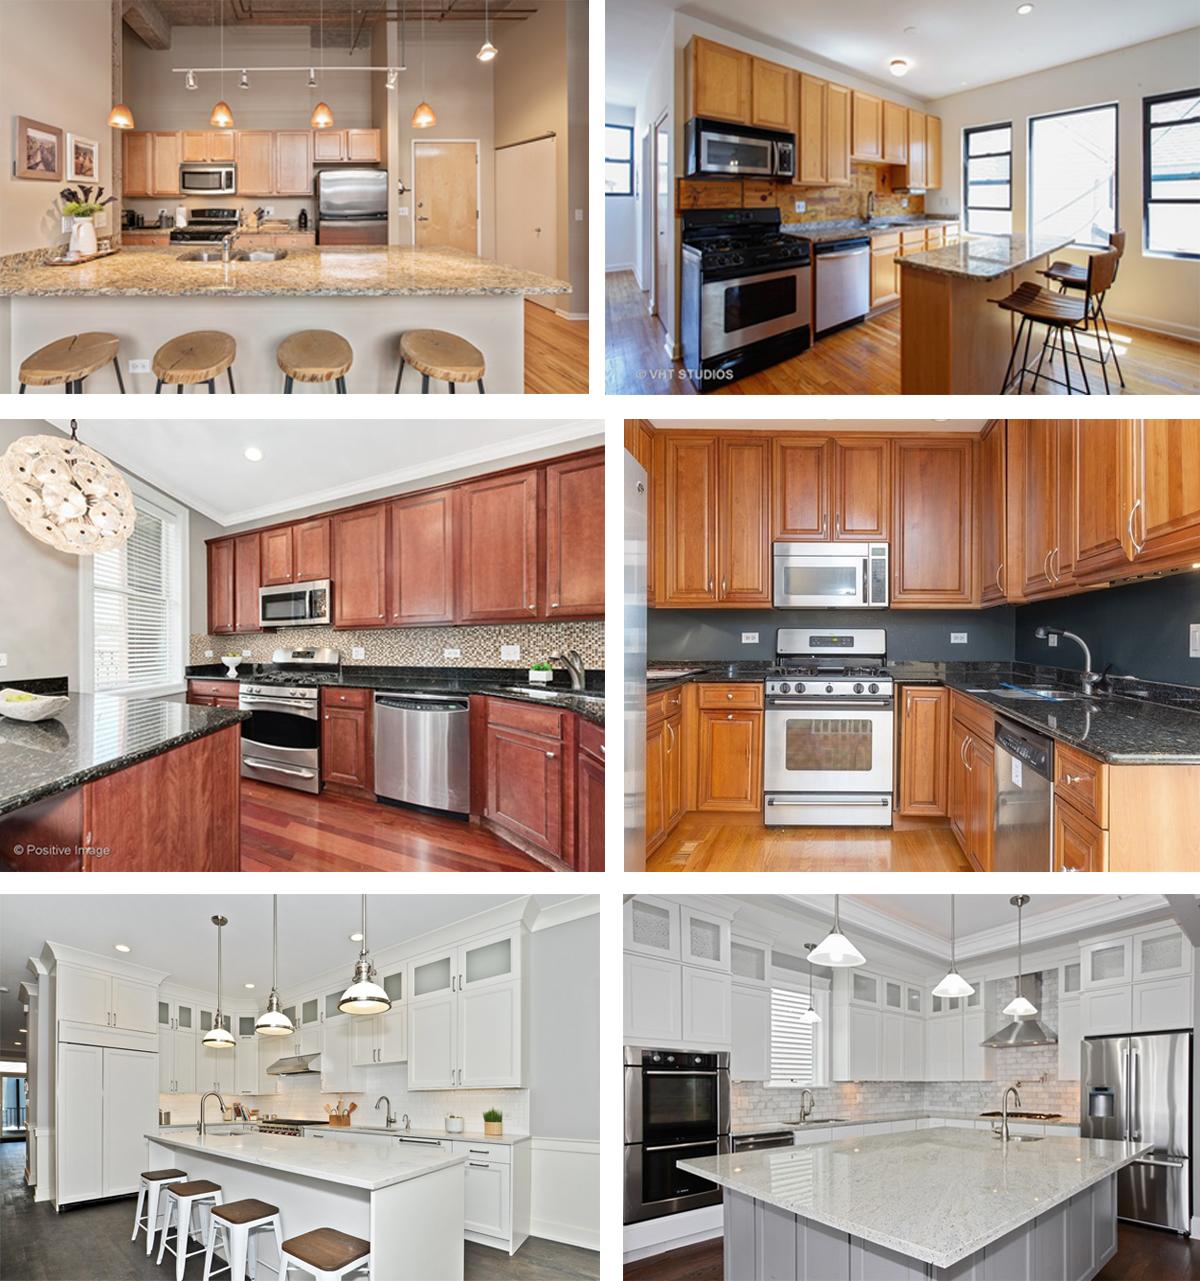 kitchens through the years.jpg